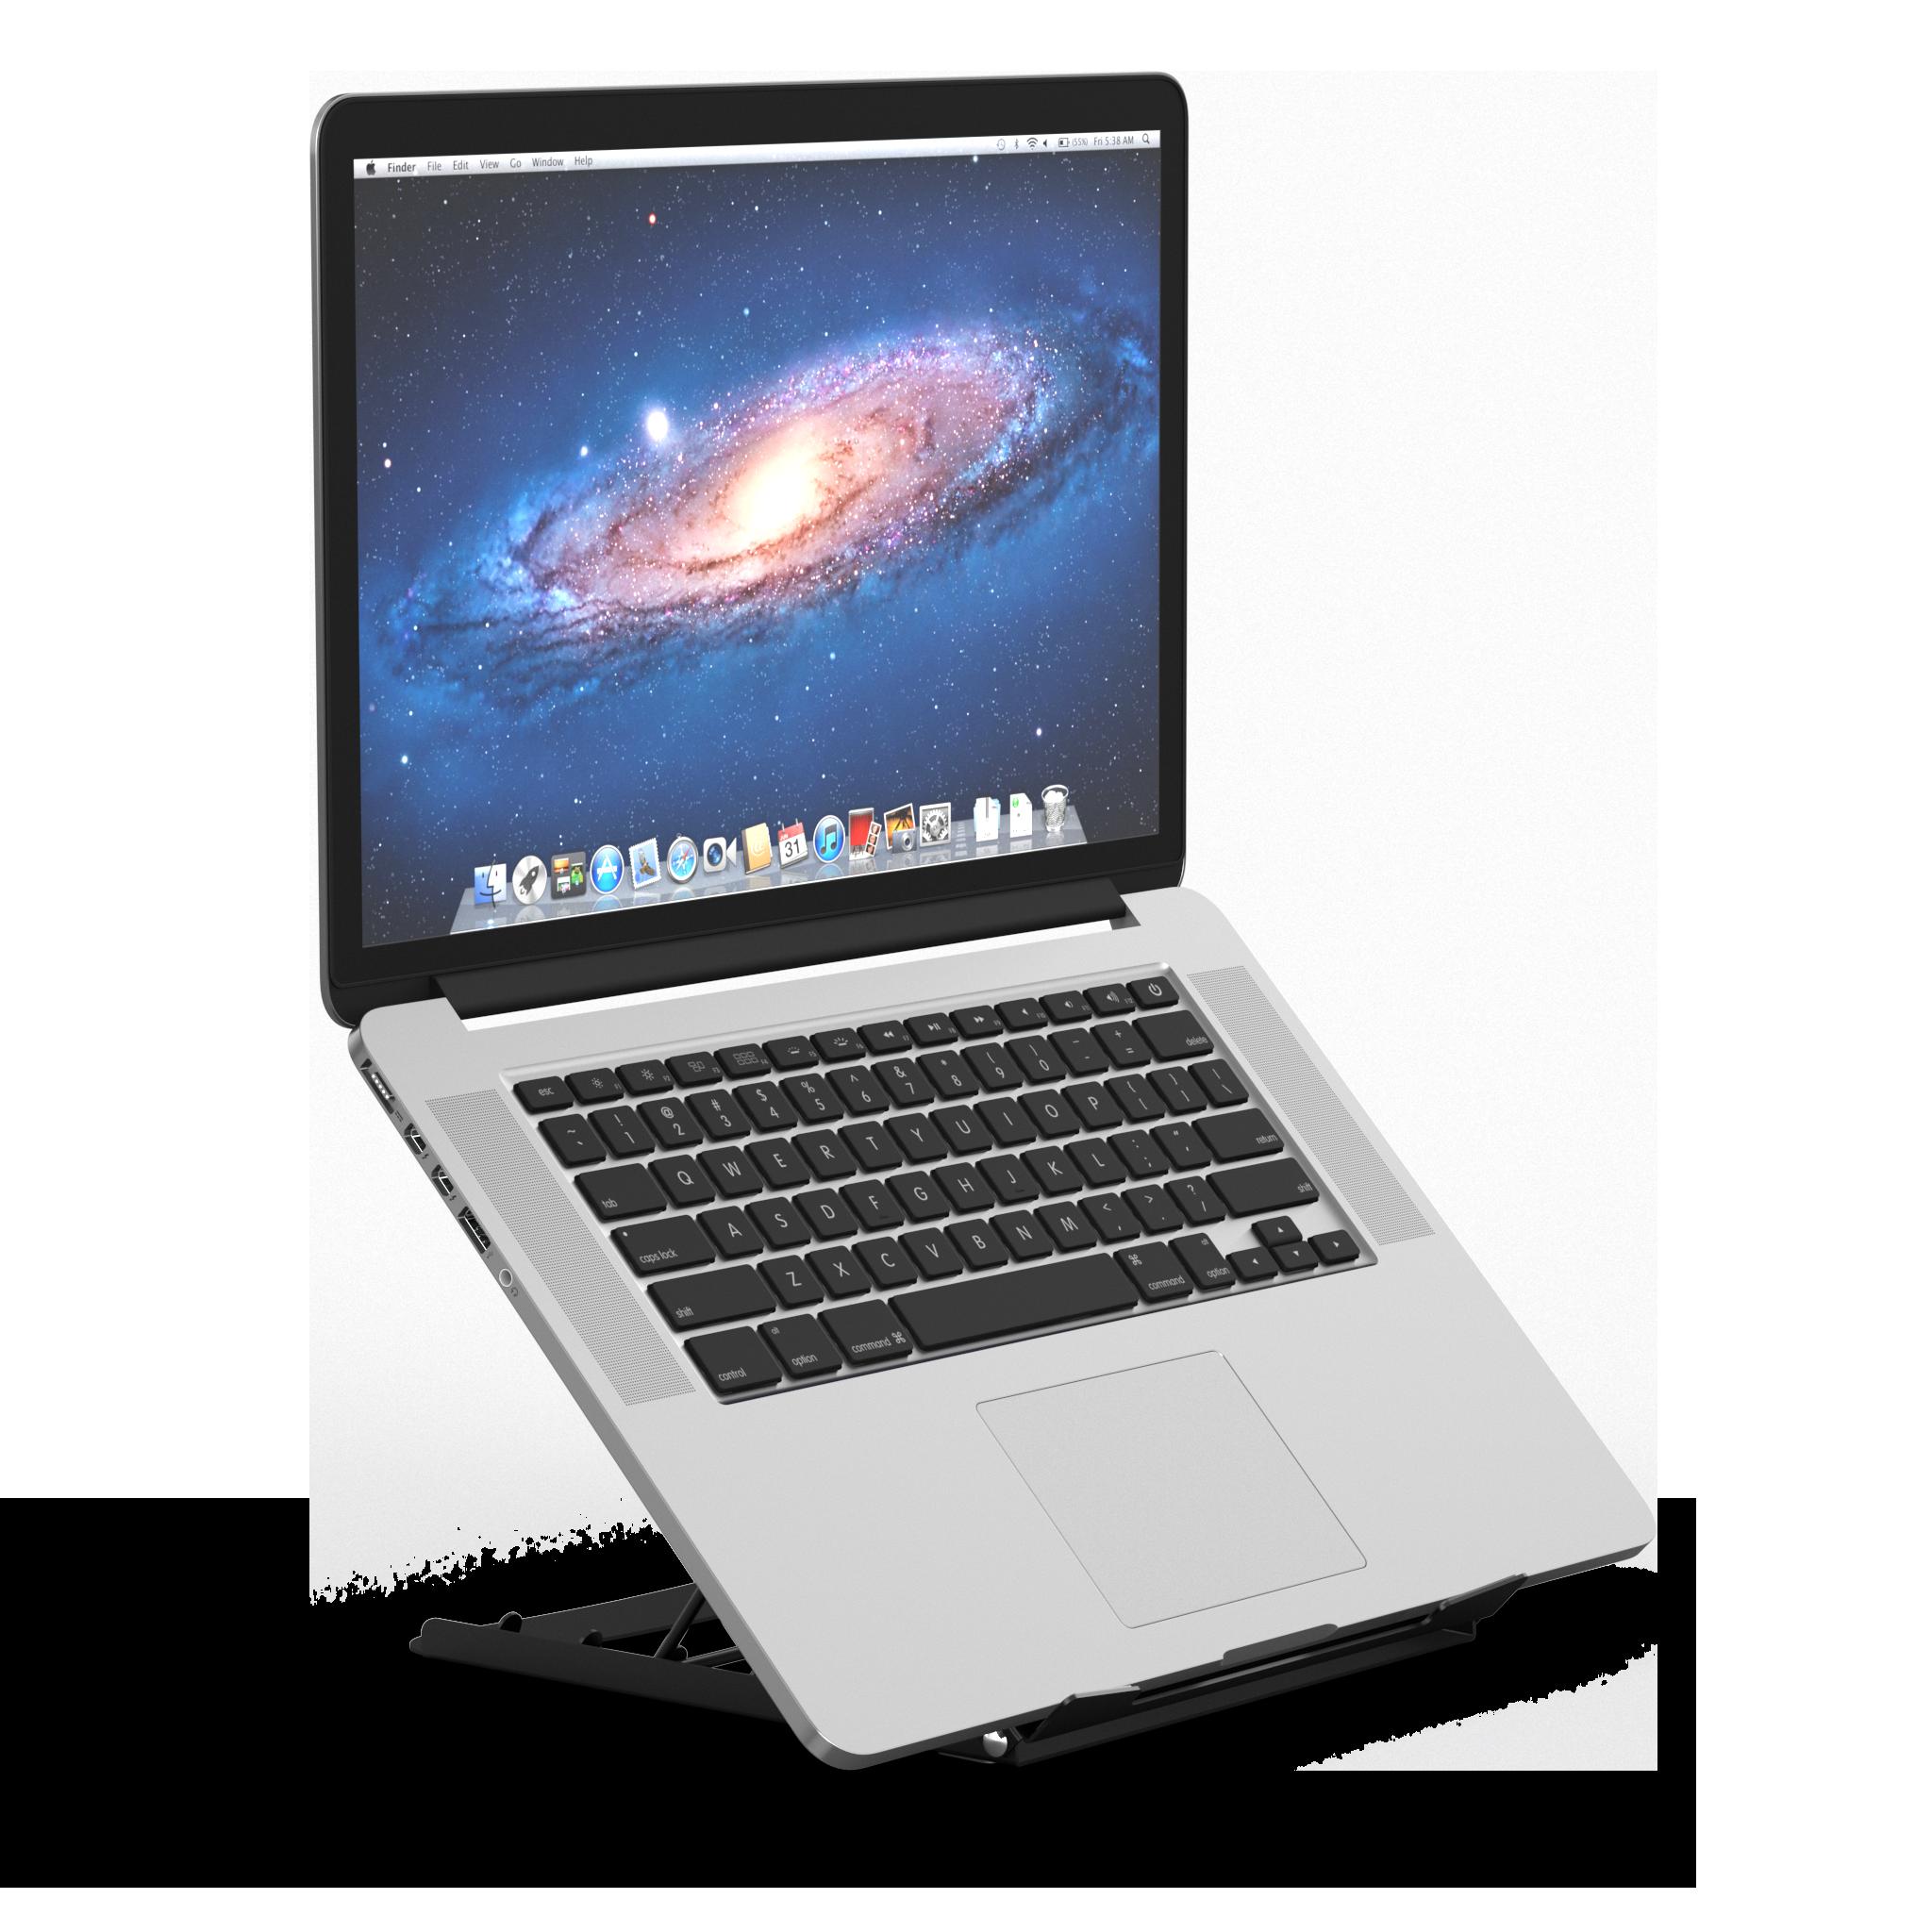 Laptopverhoger opvouwbaar